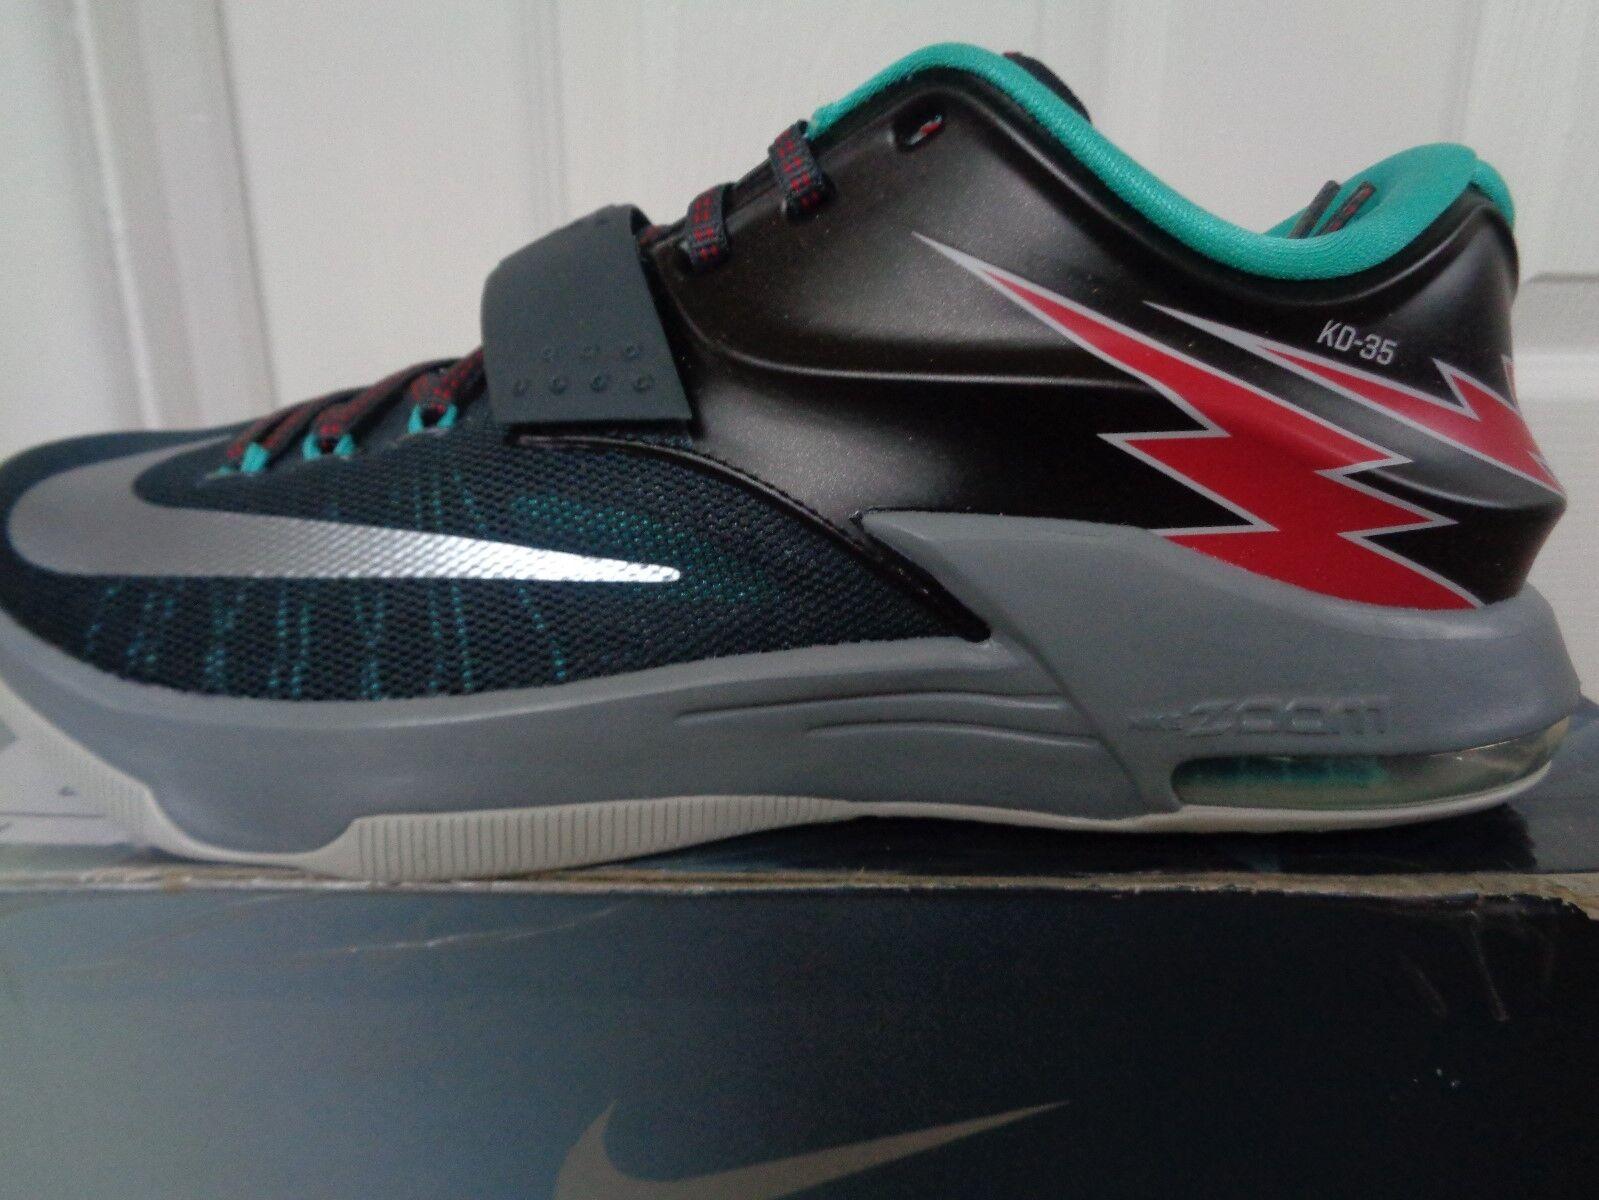 Nike KD VII sneakers basketball trainers 653996 005 eu 43 us 9.5 NEW